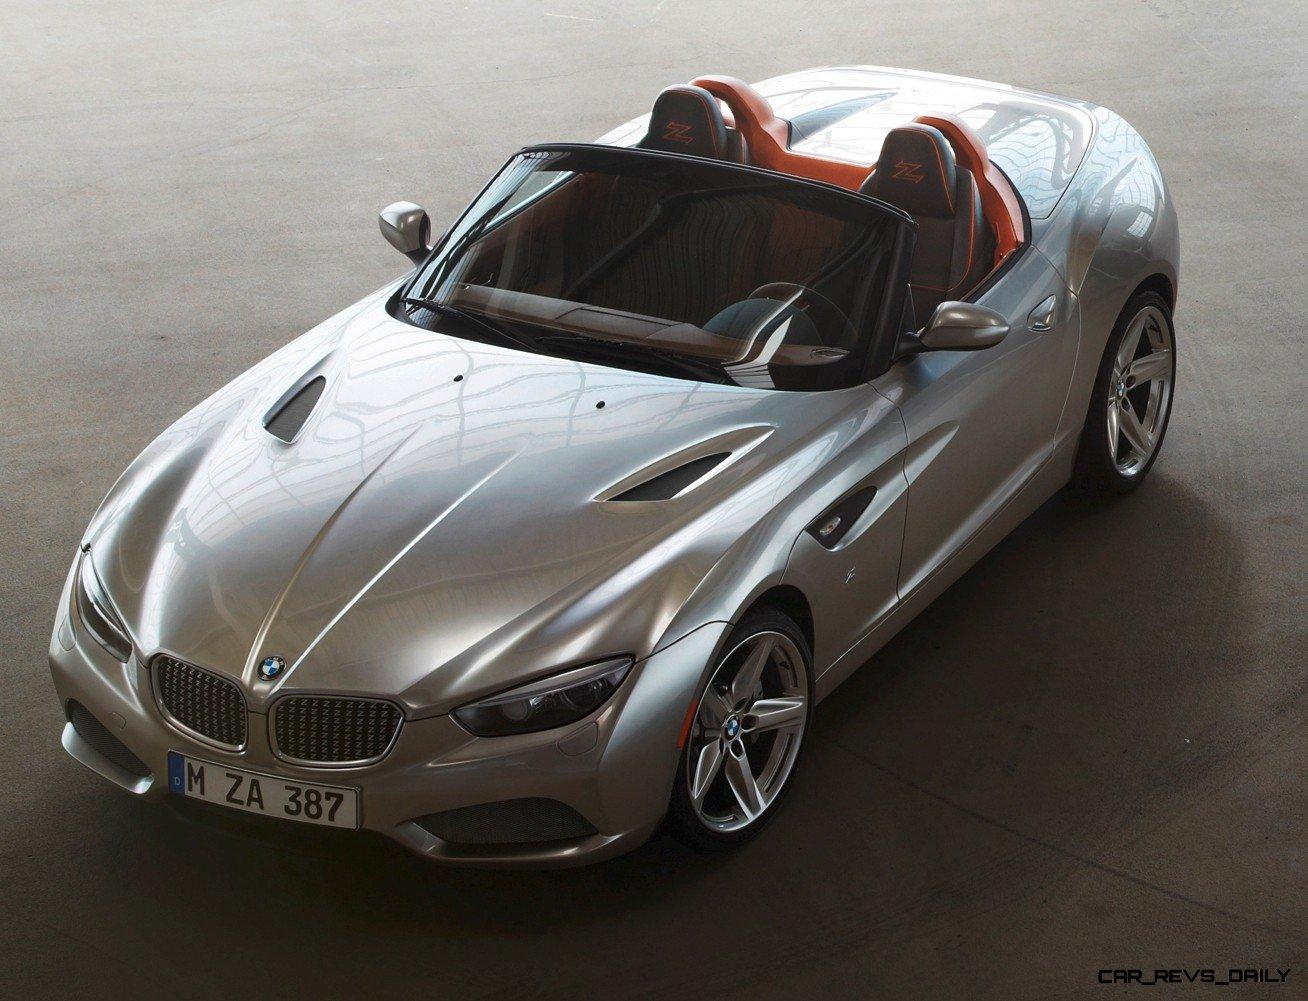 2012 Bmw Zagato Roadster Concept (48 Images) - HD Car Wallpaper